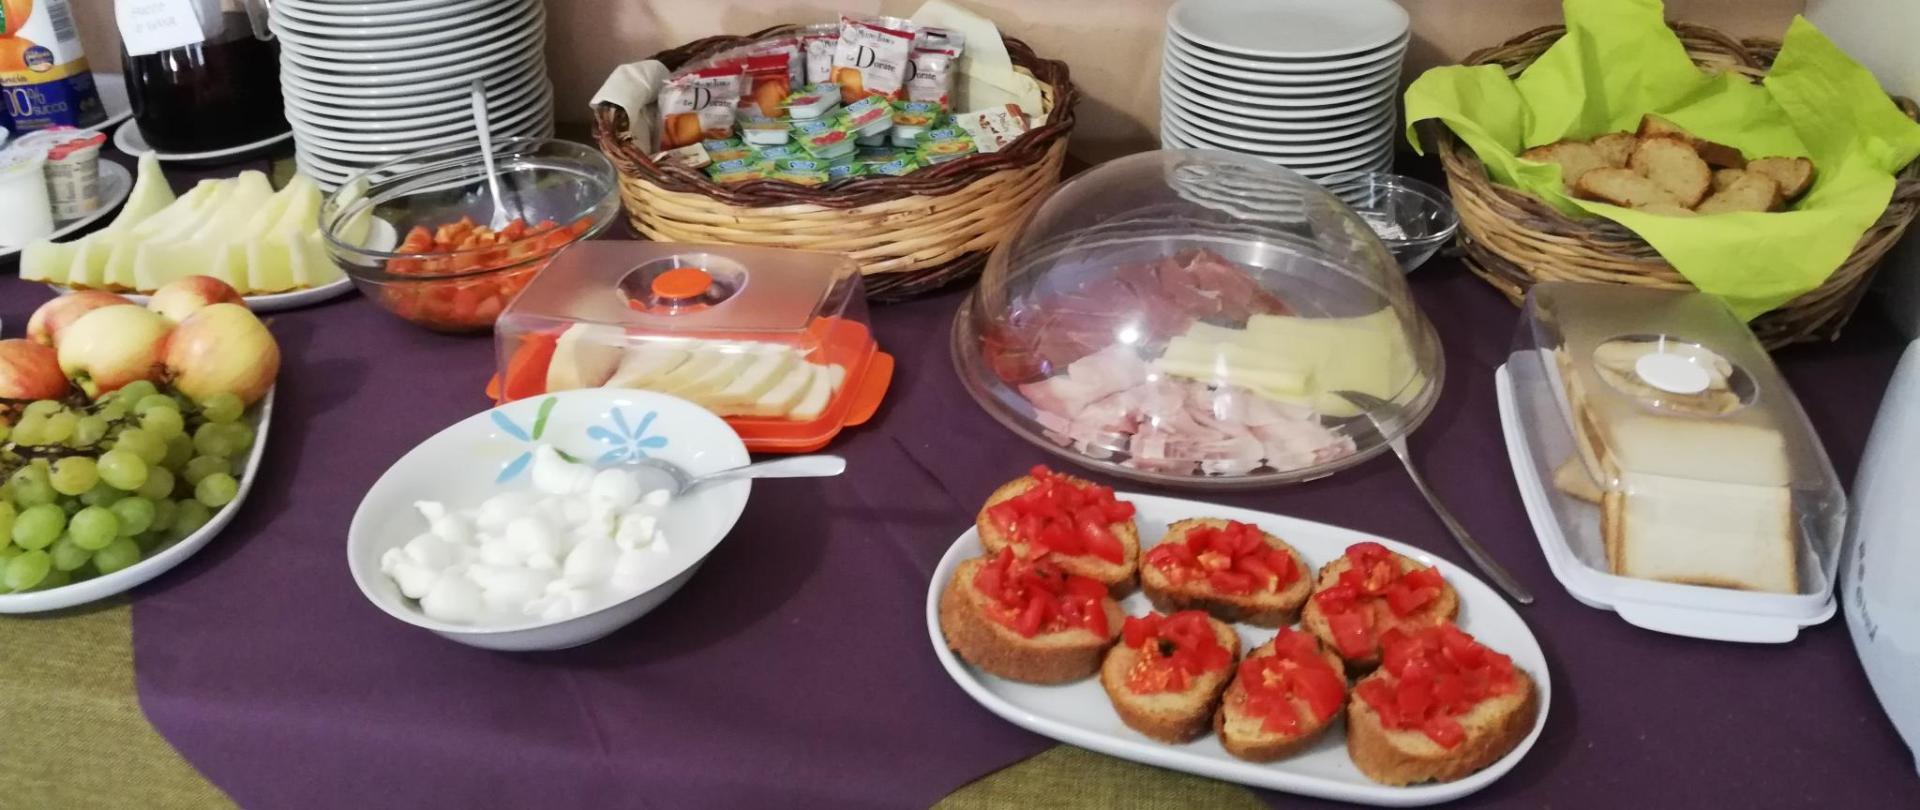 6 buffet colazione (4).jpg